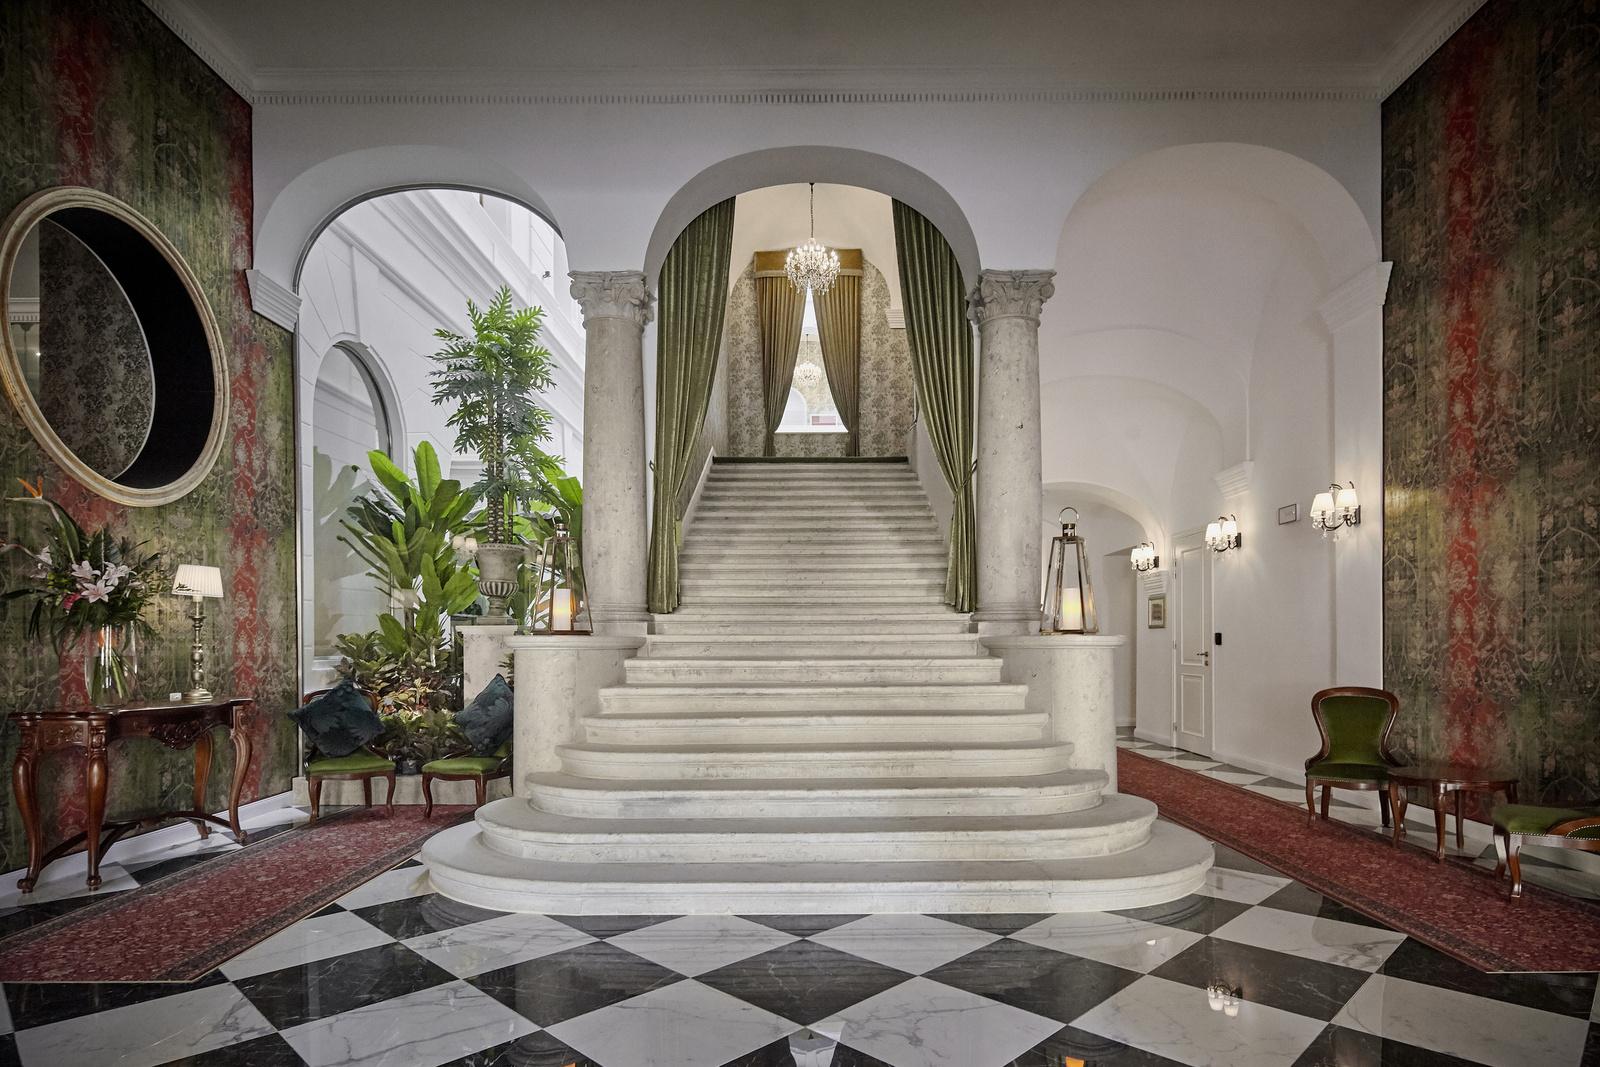 MysteryHotel-2019-main staircase-1